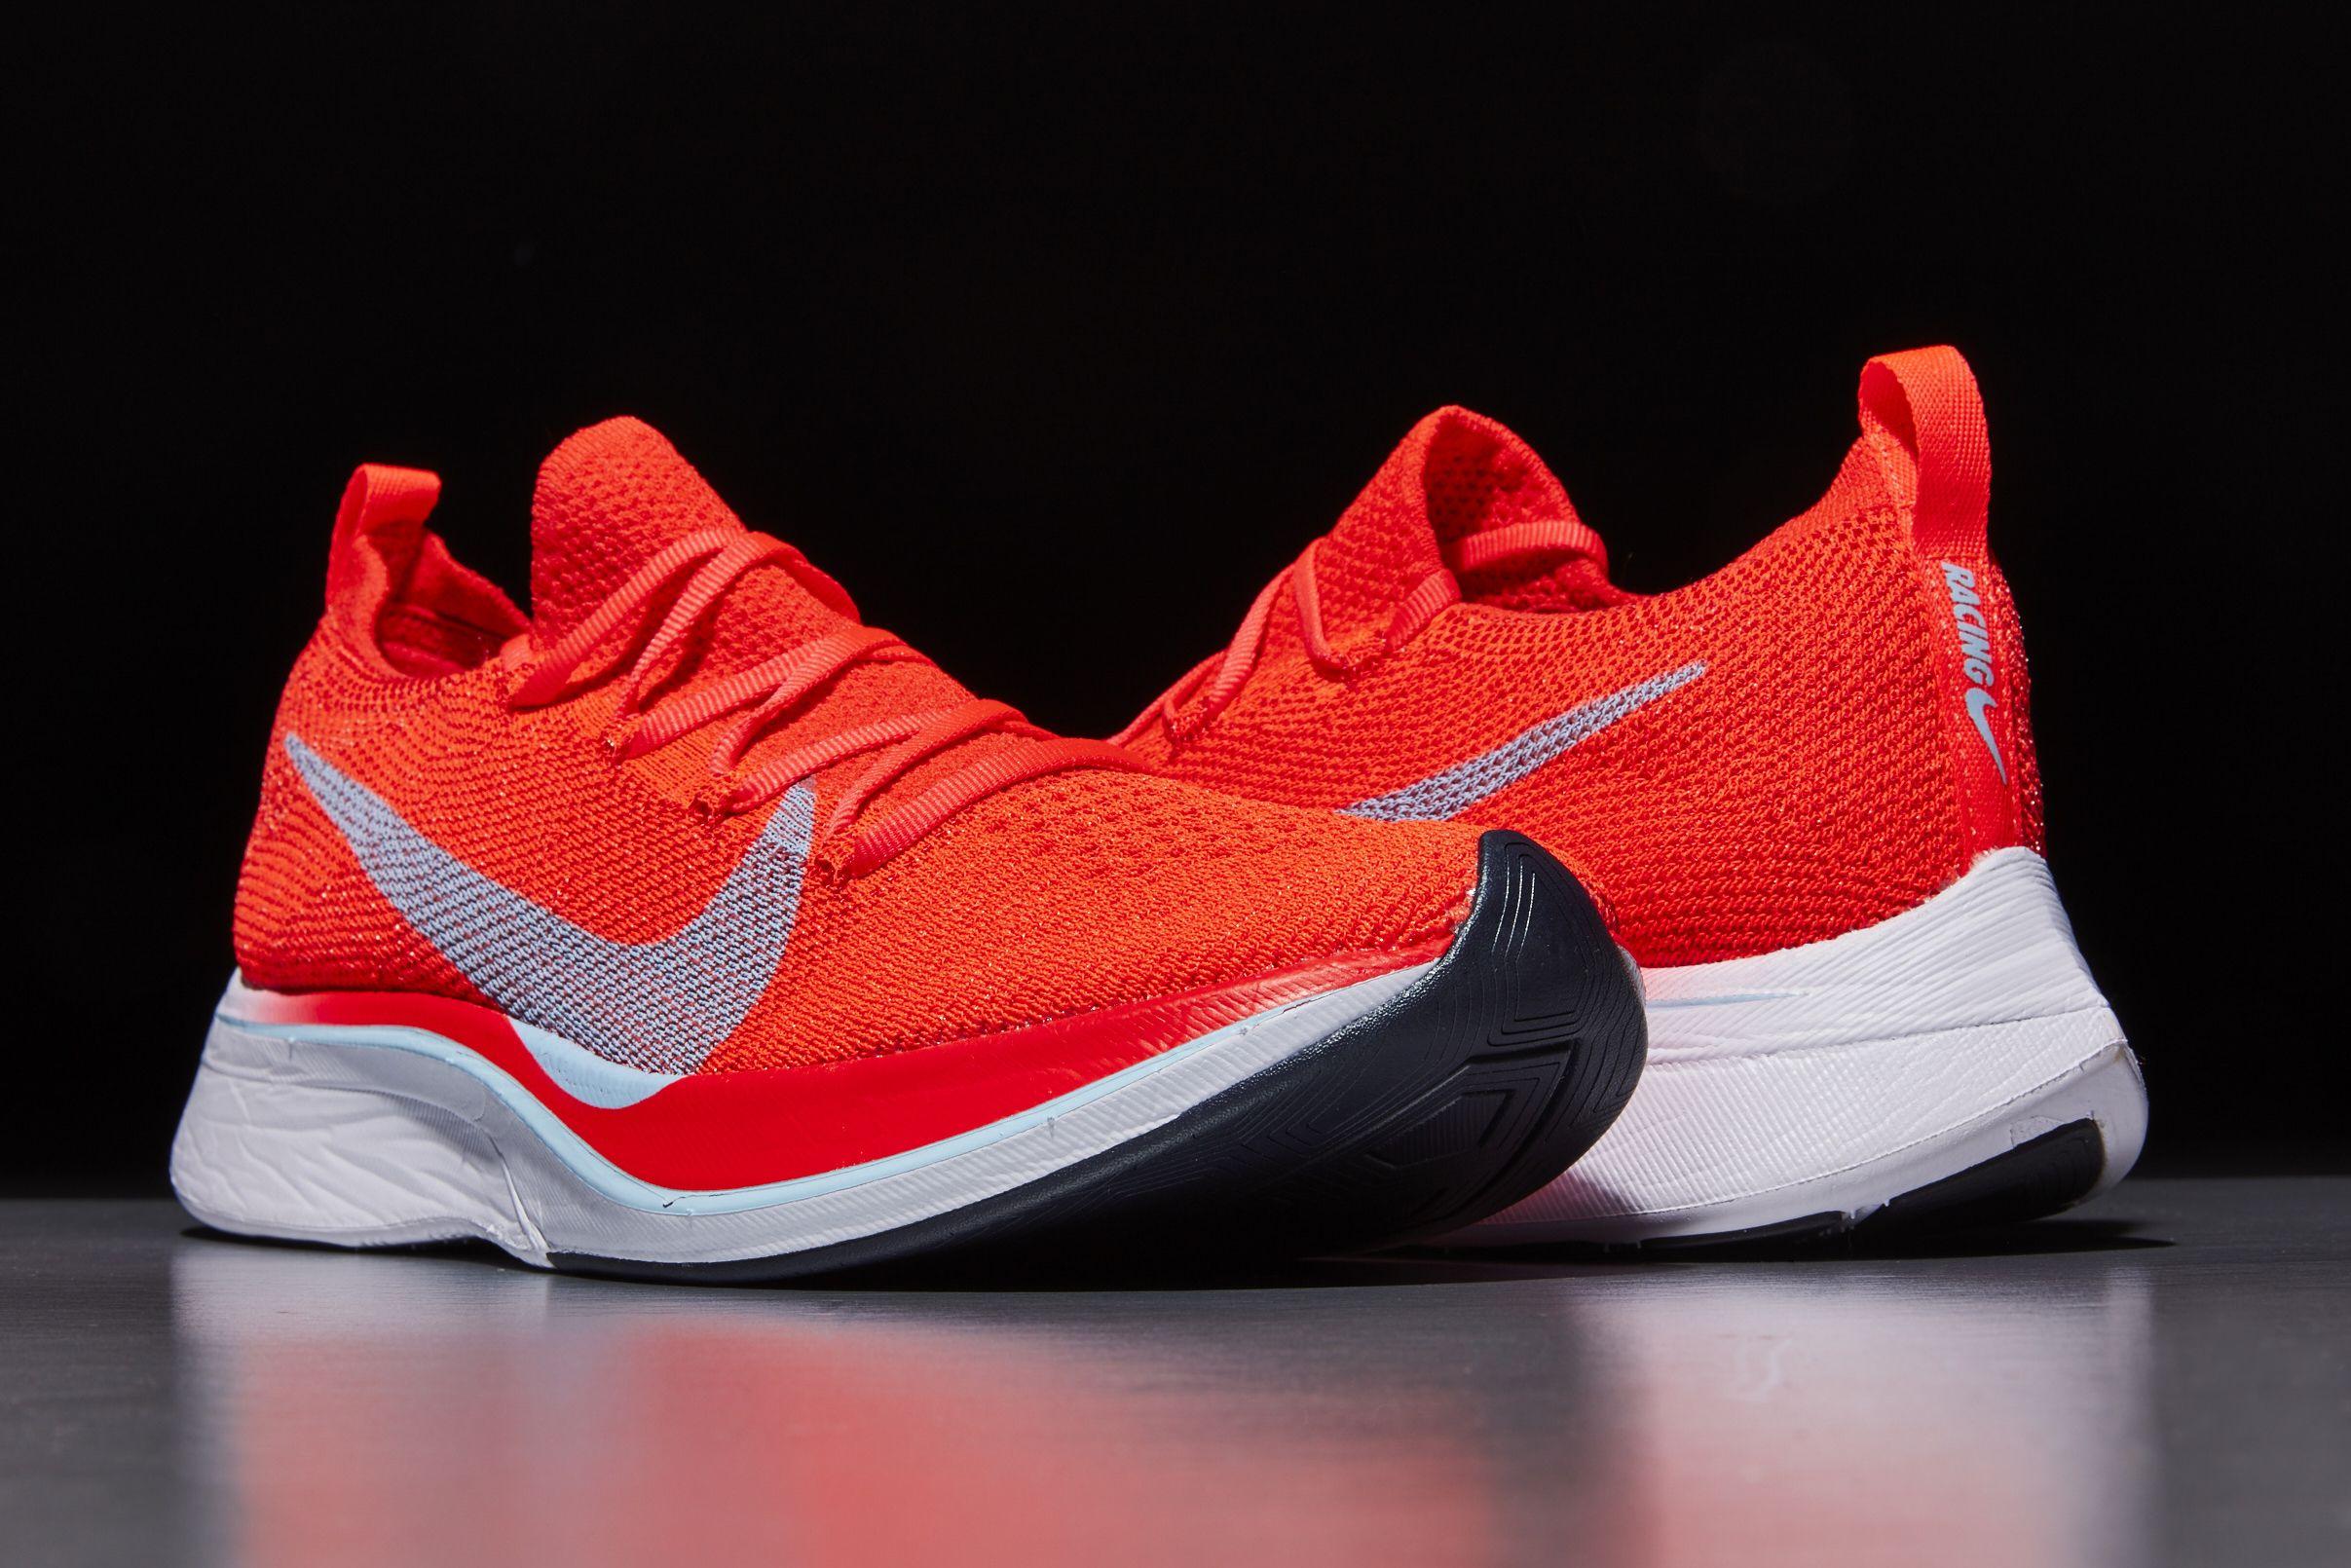 Nike Vaporfly 4 Percent \u2014 New Nike Shoes